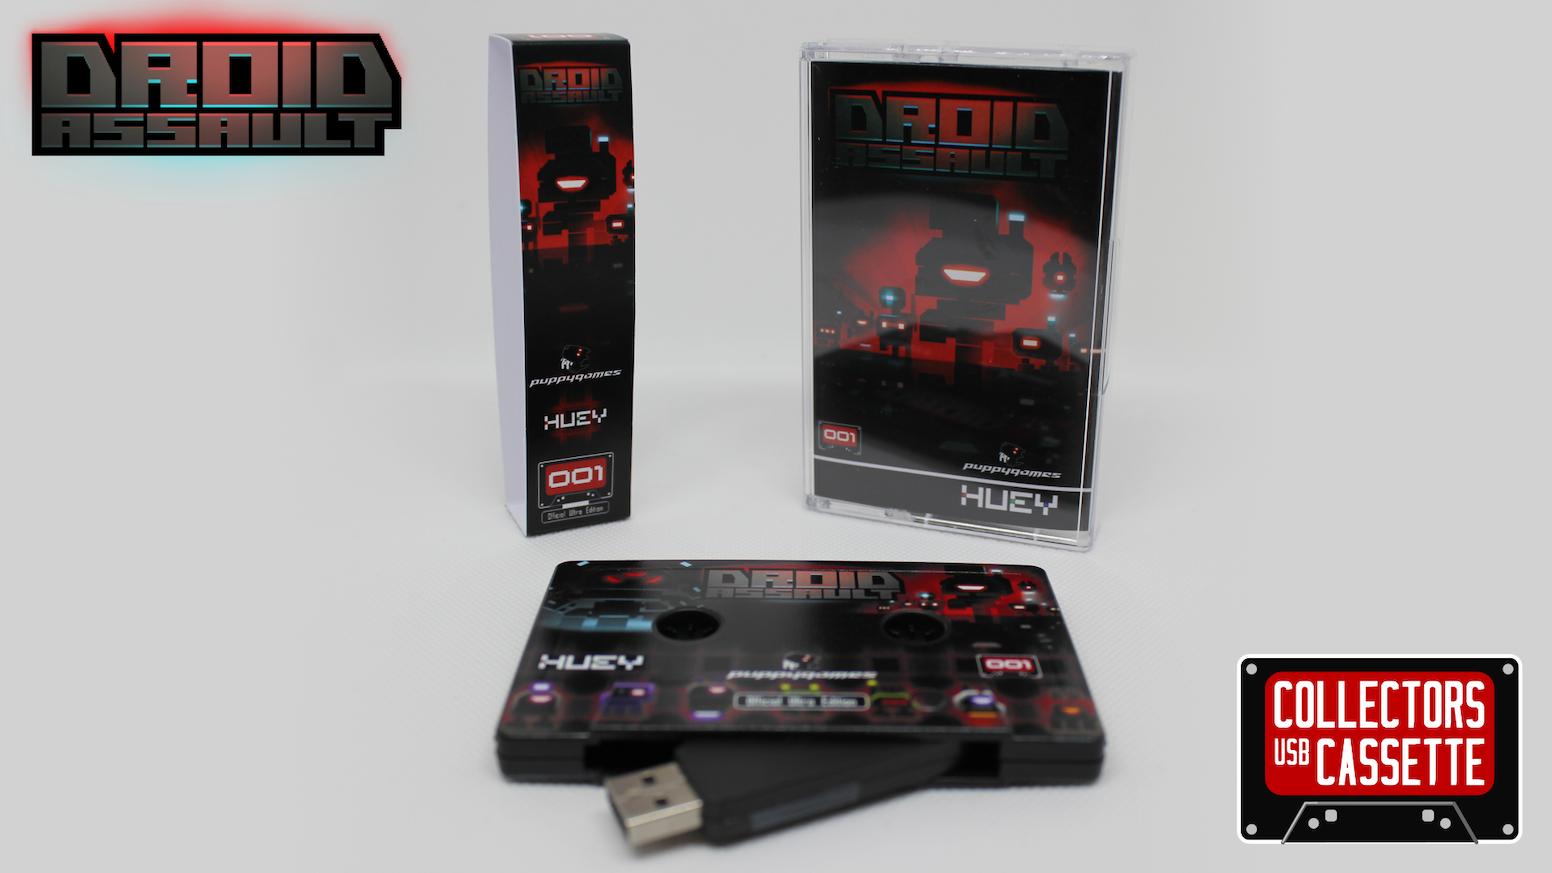 Exclusive collectors USB cassette featuring Droid Assault (DRM free) plus loads of bonus extras. Missed the Kickstarter? No problem, click below to get your copy.